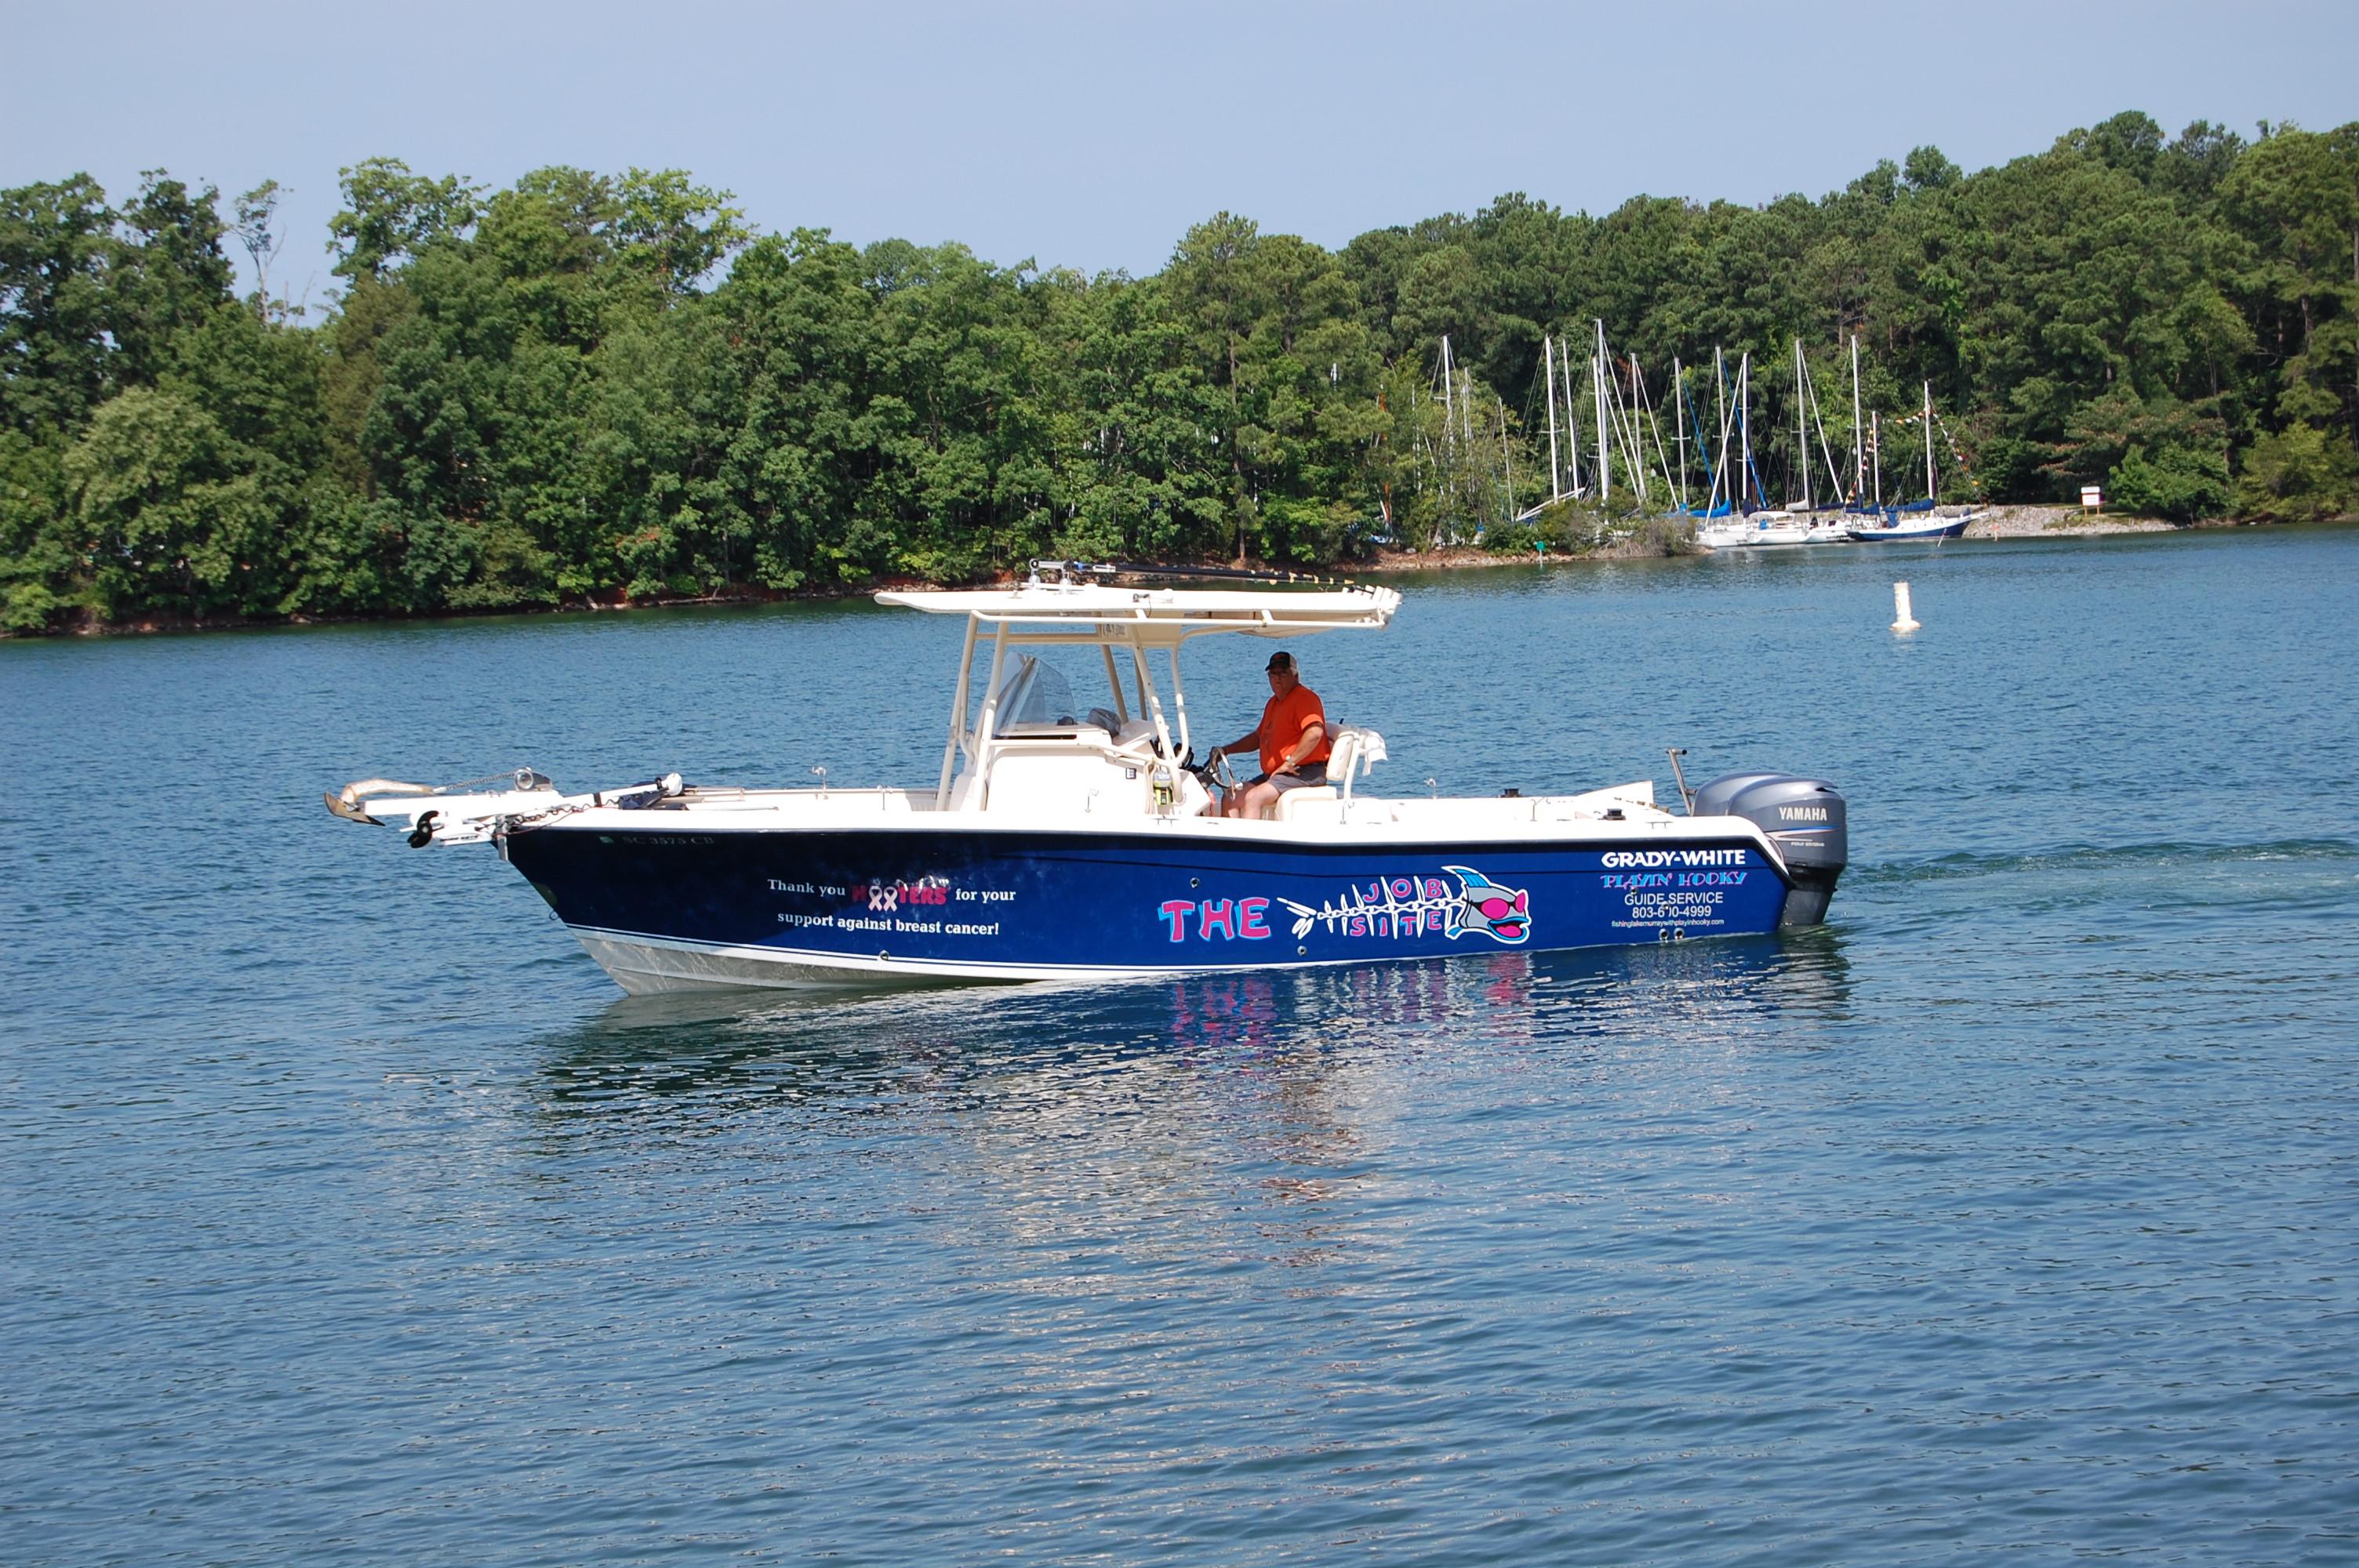 Playin Hooky Fishing Guide Service - Columbia, SC 29212 - (803)600-4999 | ShowMeLocal.com